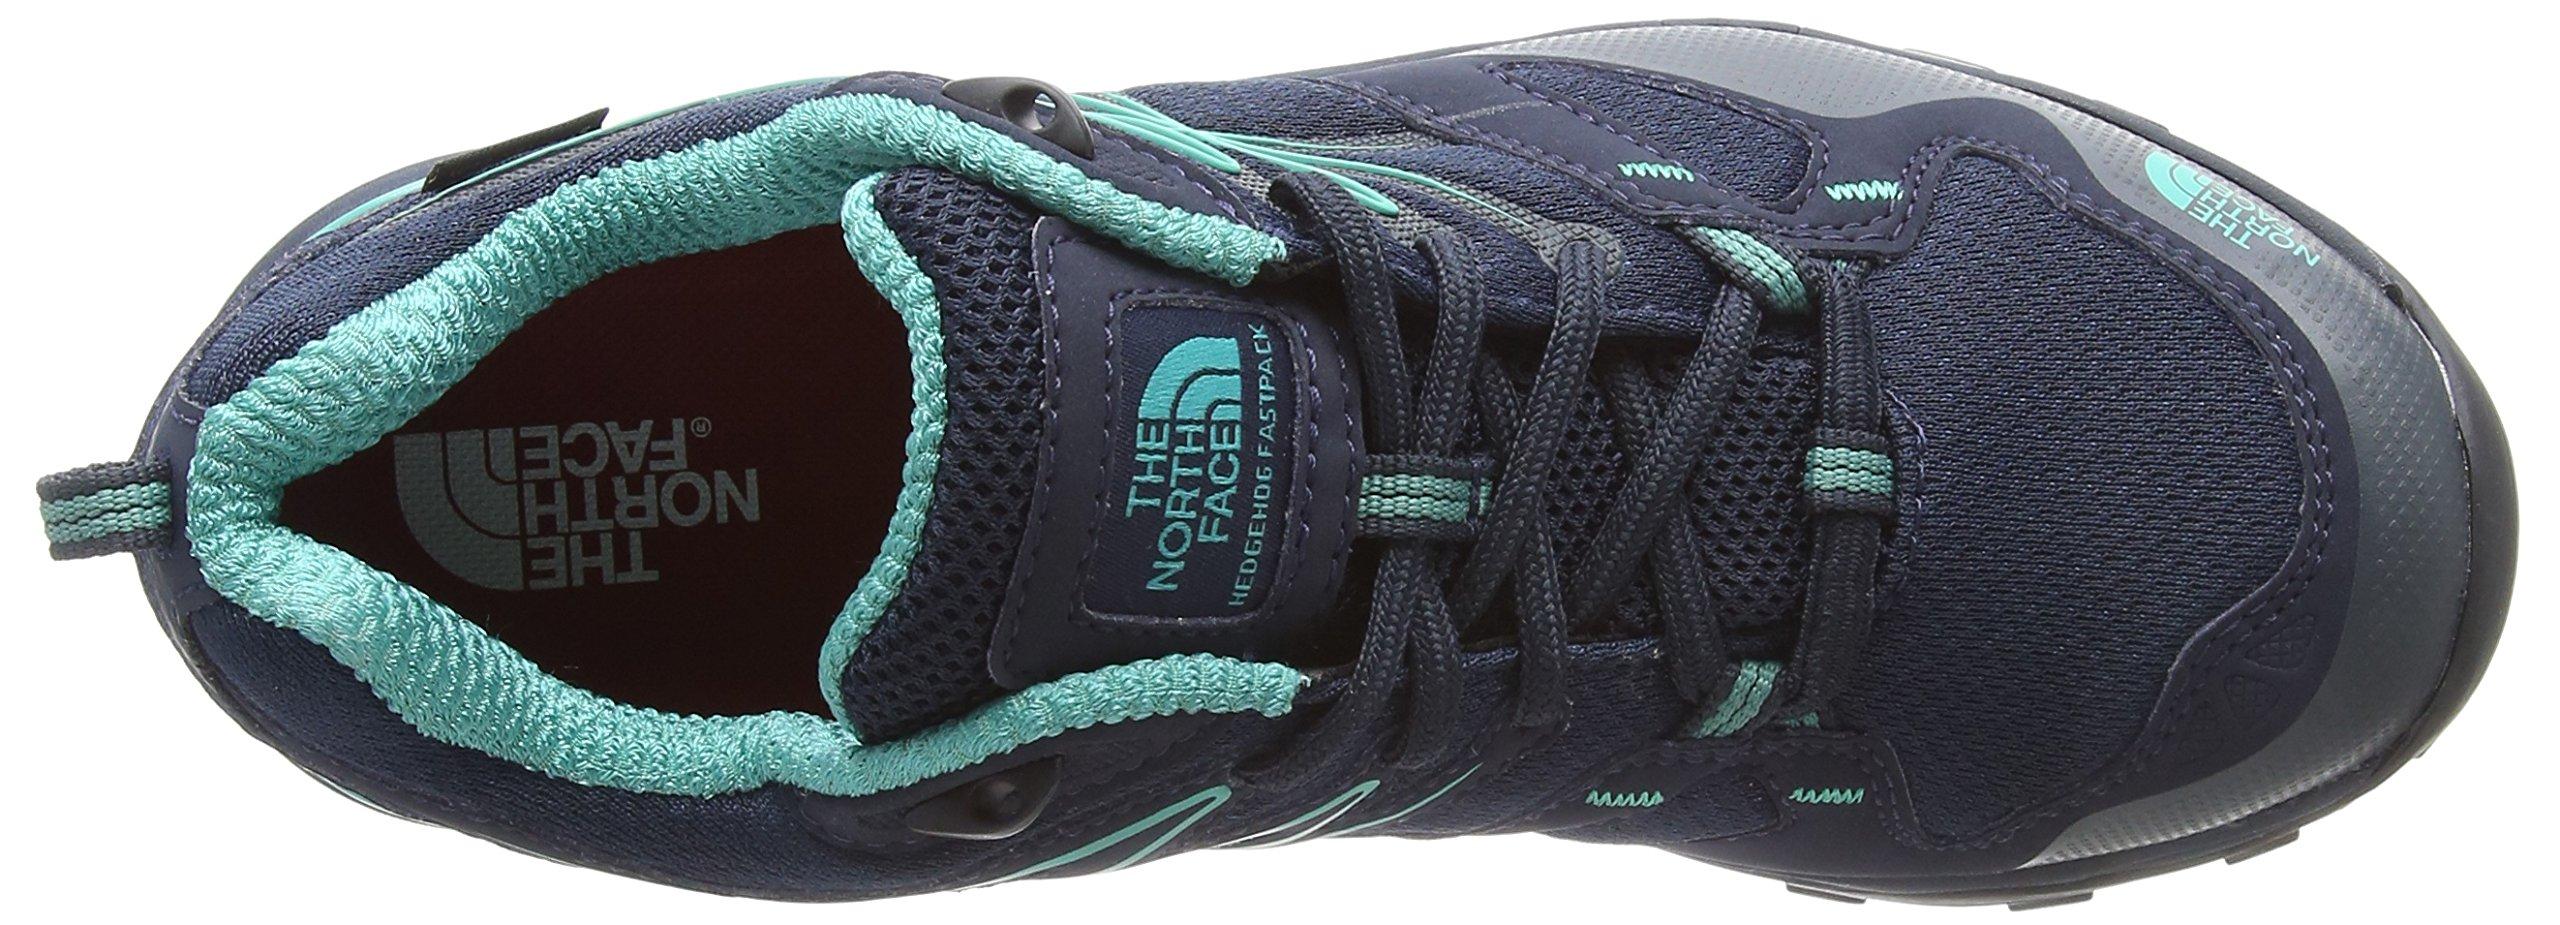 81OTcVpioPL - THE NORTH FACE Women's Hedgehog Fastpack Gore-tex (EU) Low Rise Hiking Boots